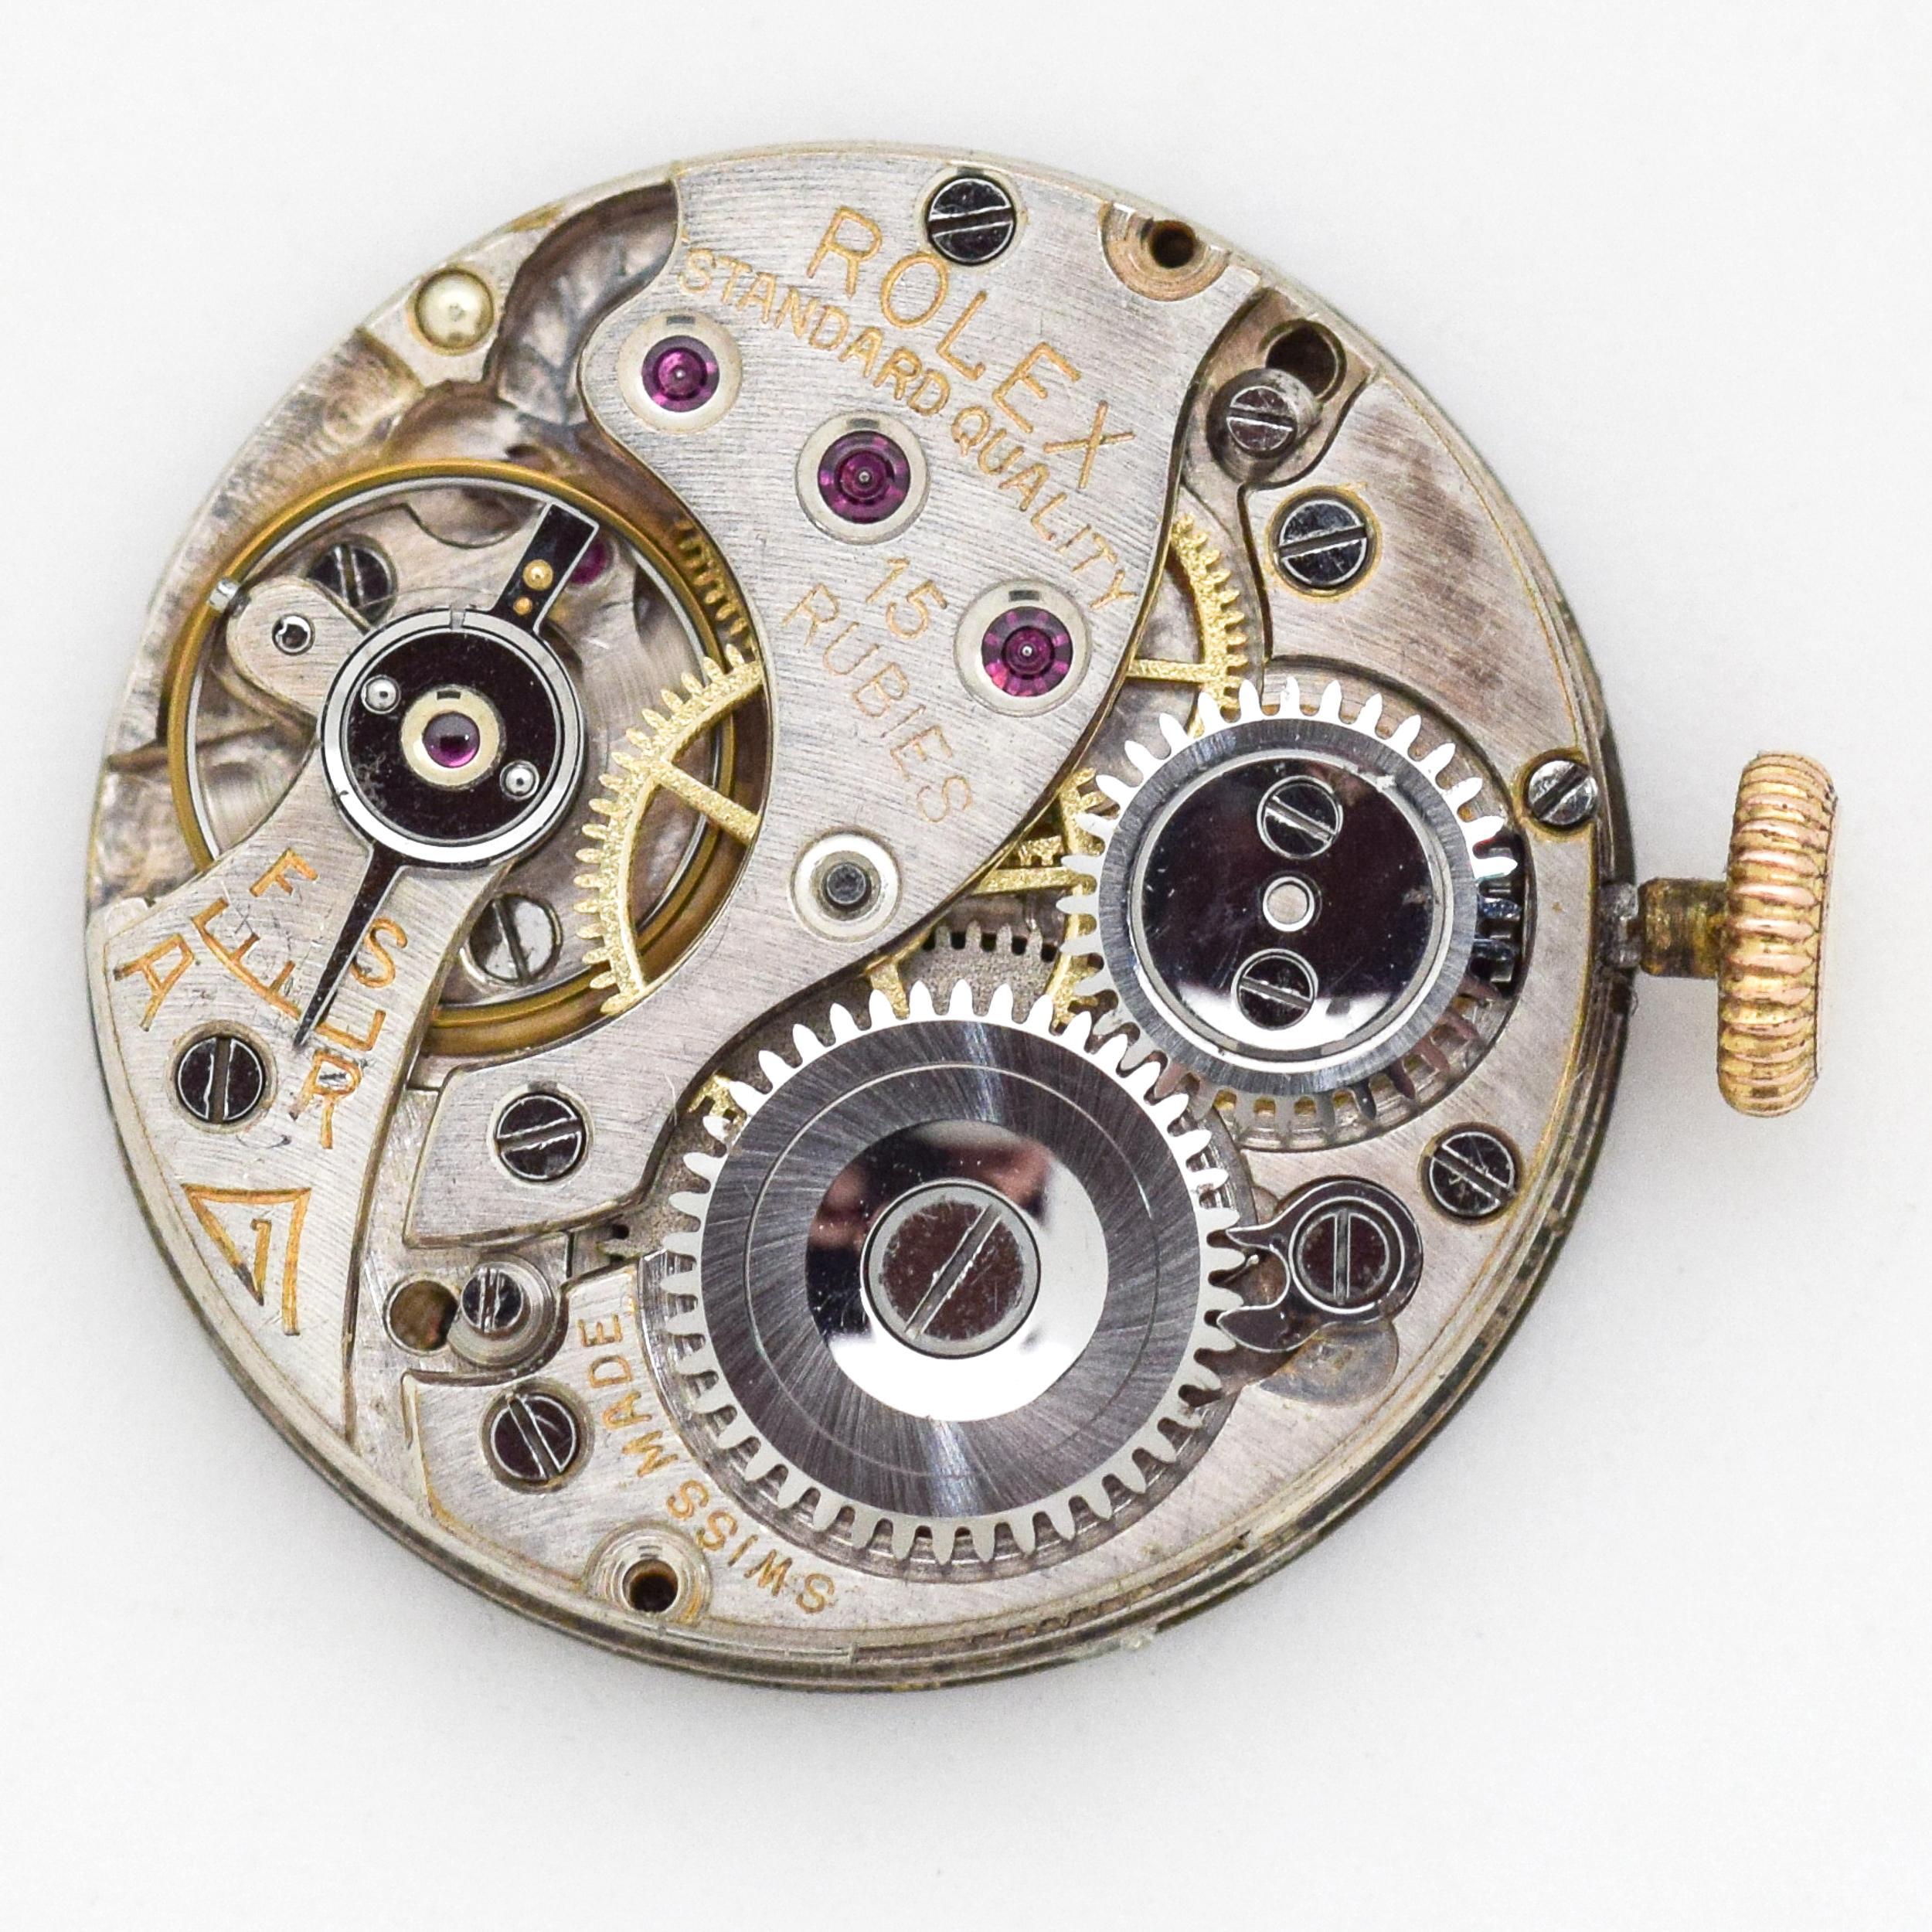 92580dd6d1f Vintage Rolex Ladies 9 Karat Rose Gold Watch, 1910s For Sale at 1stdibs